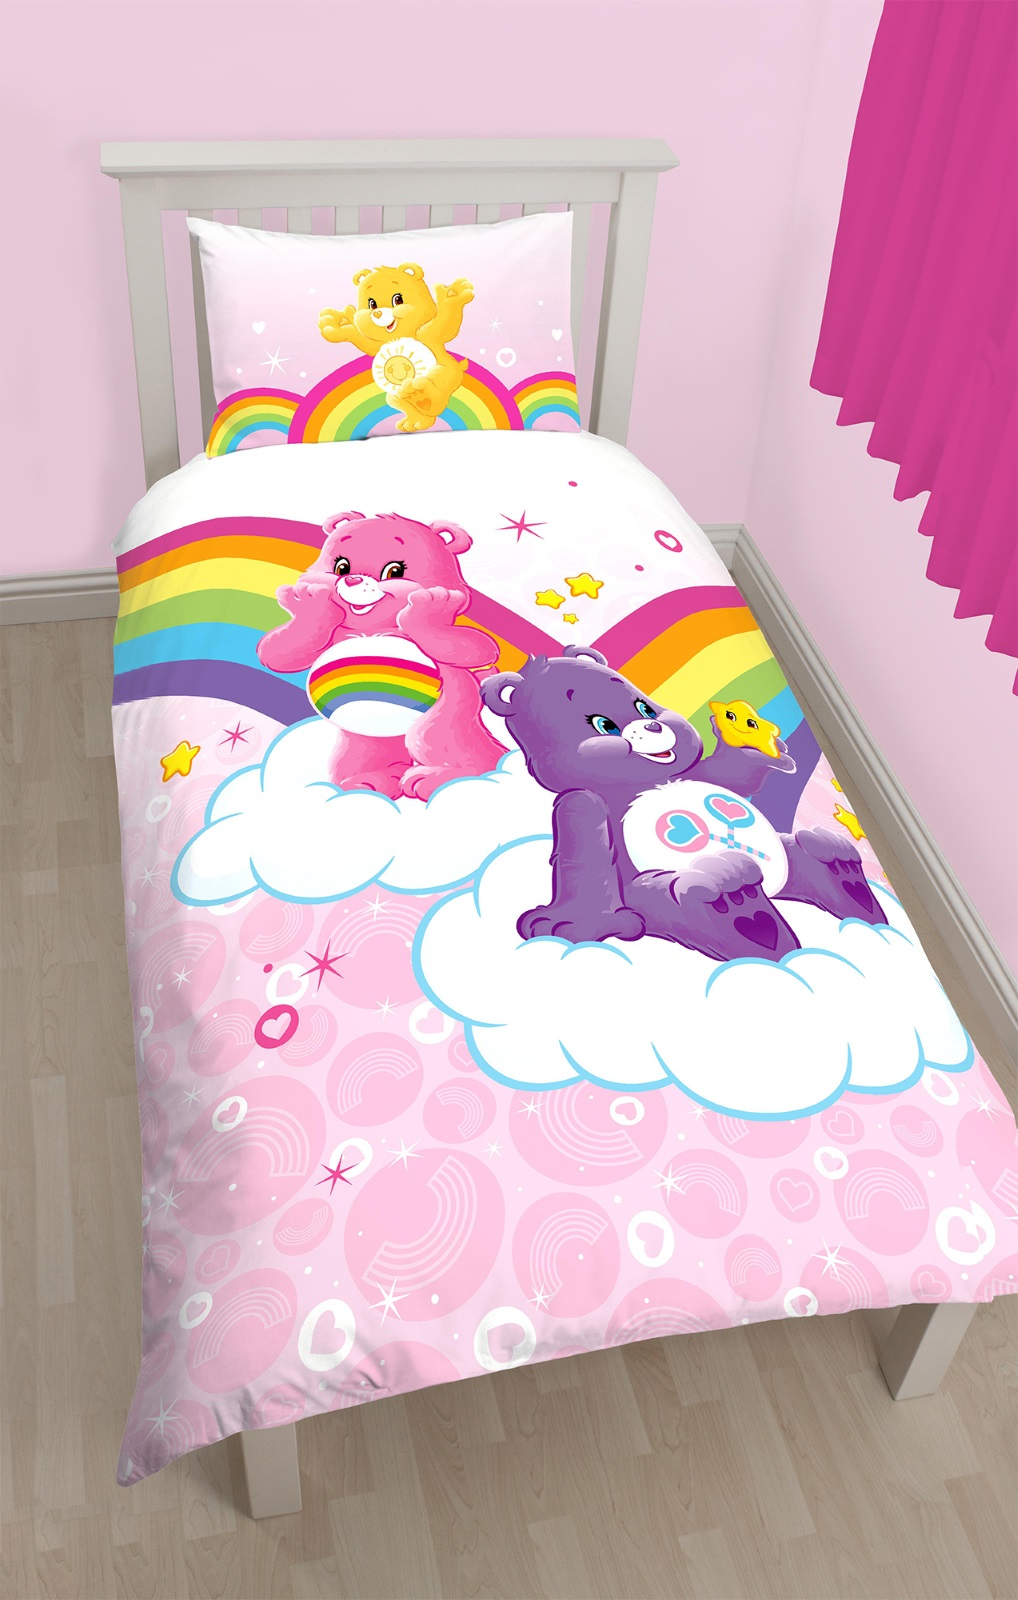 gl cksb rchis rosa baumwolle mischung einzelbett bettdecke bettbezug set ebay. Black Bedroom Furniture Sets. Home Design Ideas